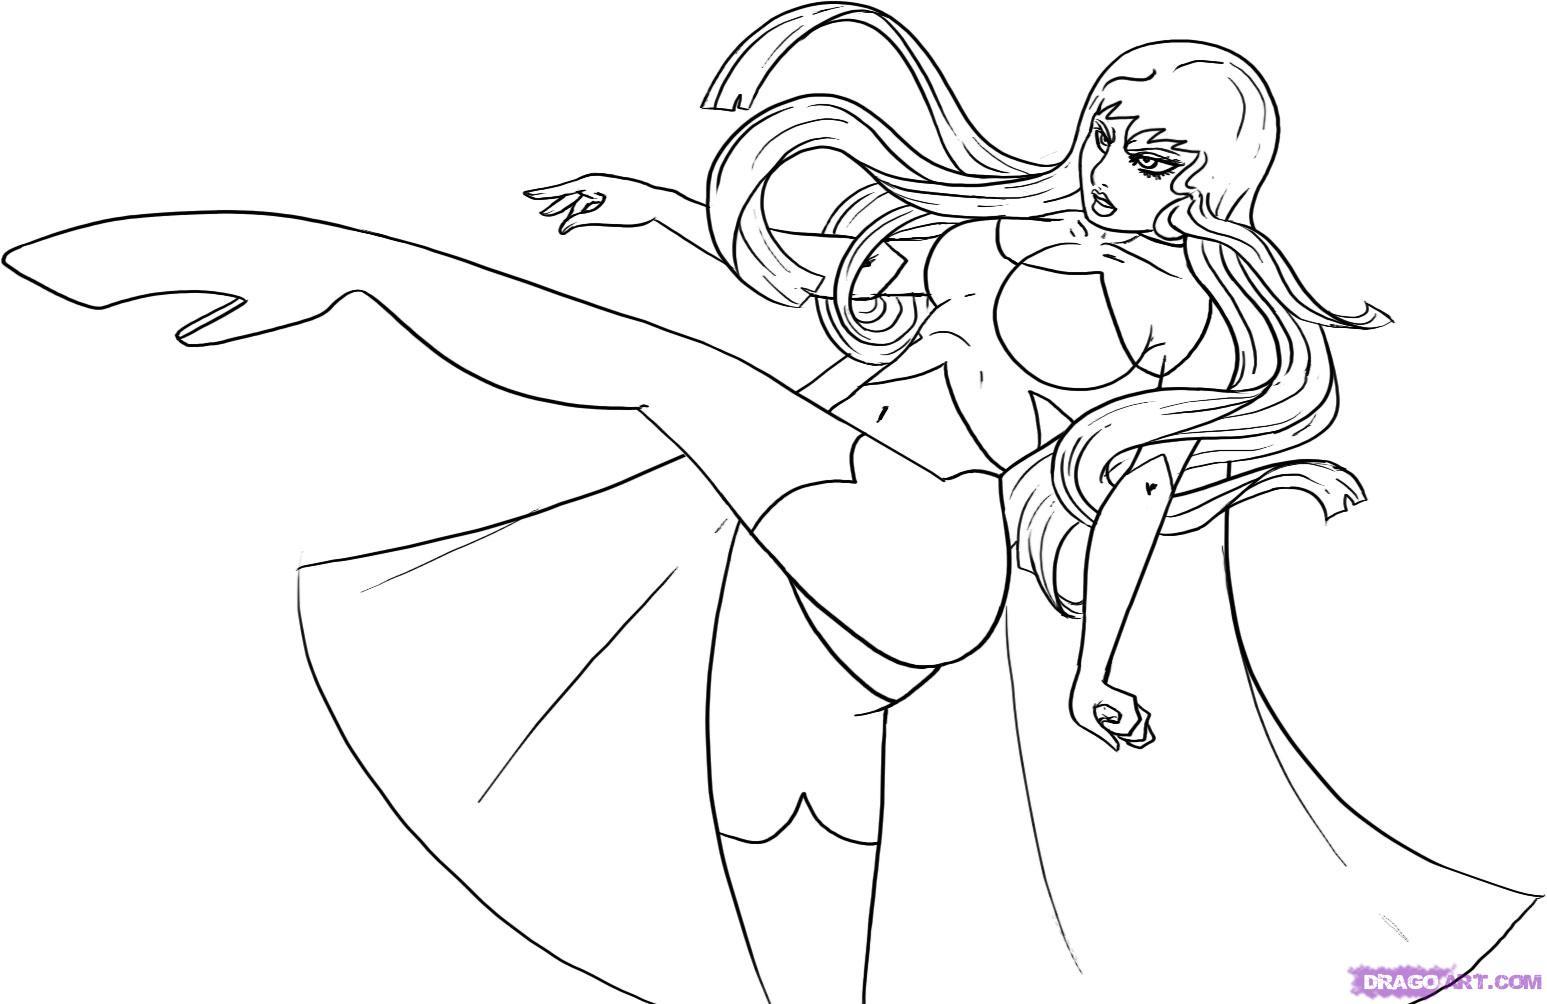 Girl Superhero Drawing at GetDrawings.com | Free for personal use ...